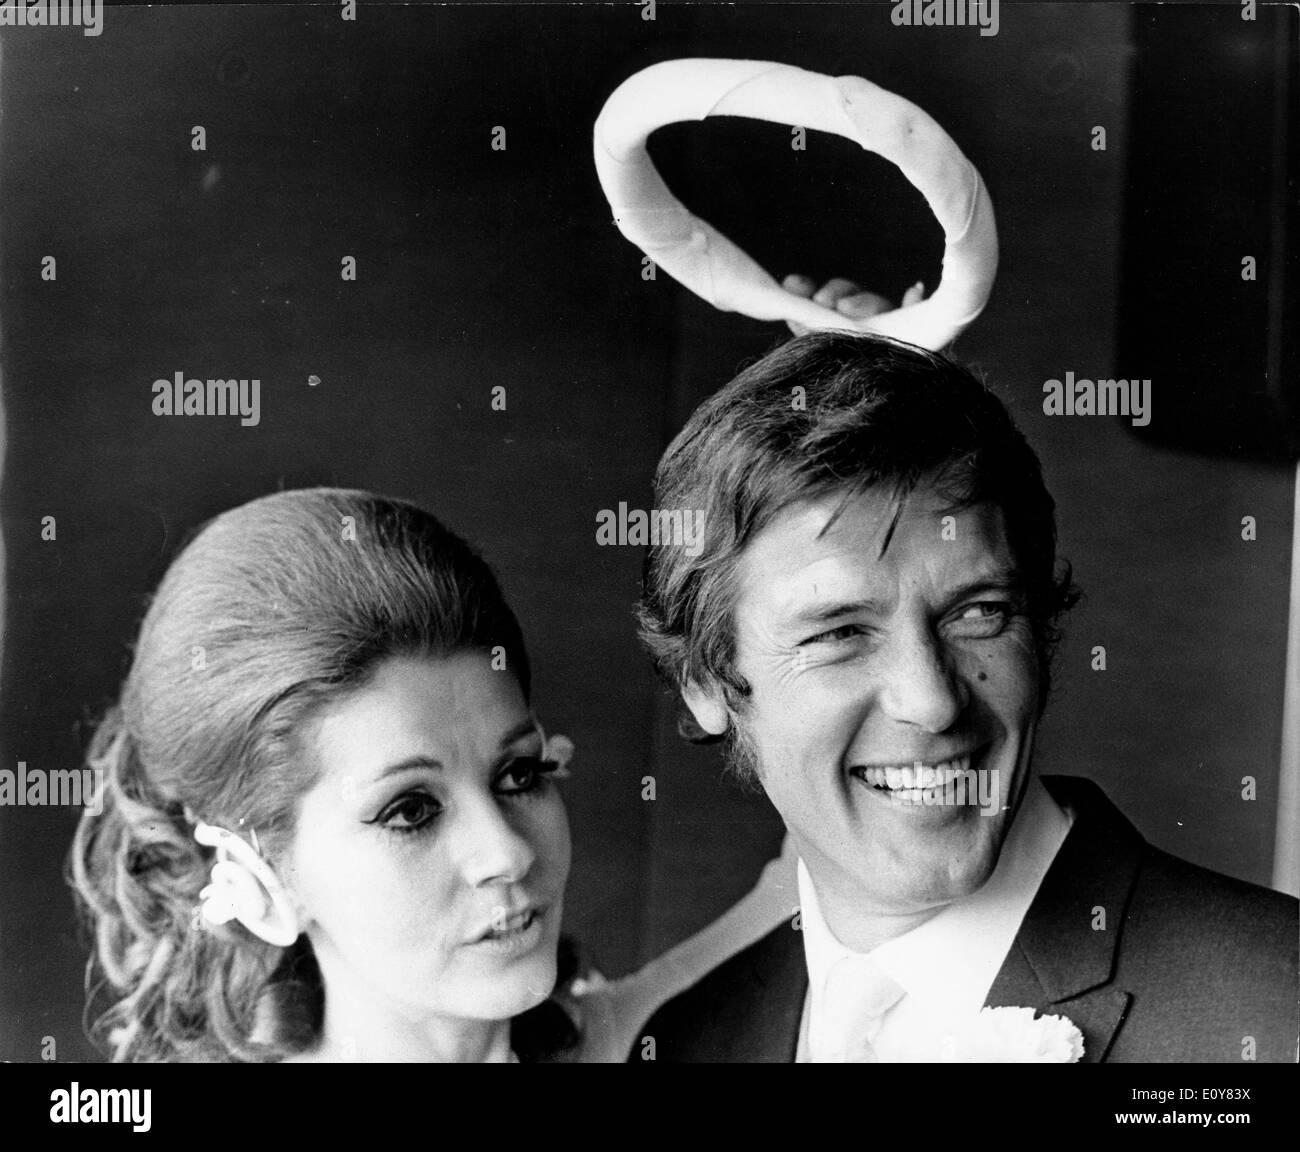 Actor Roger Moore Weds Luisa Mattioli Stock Photo